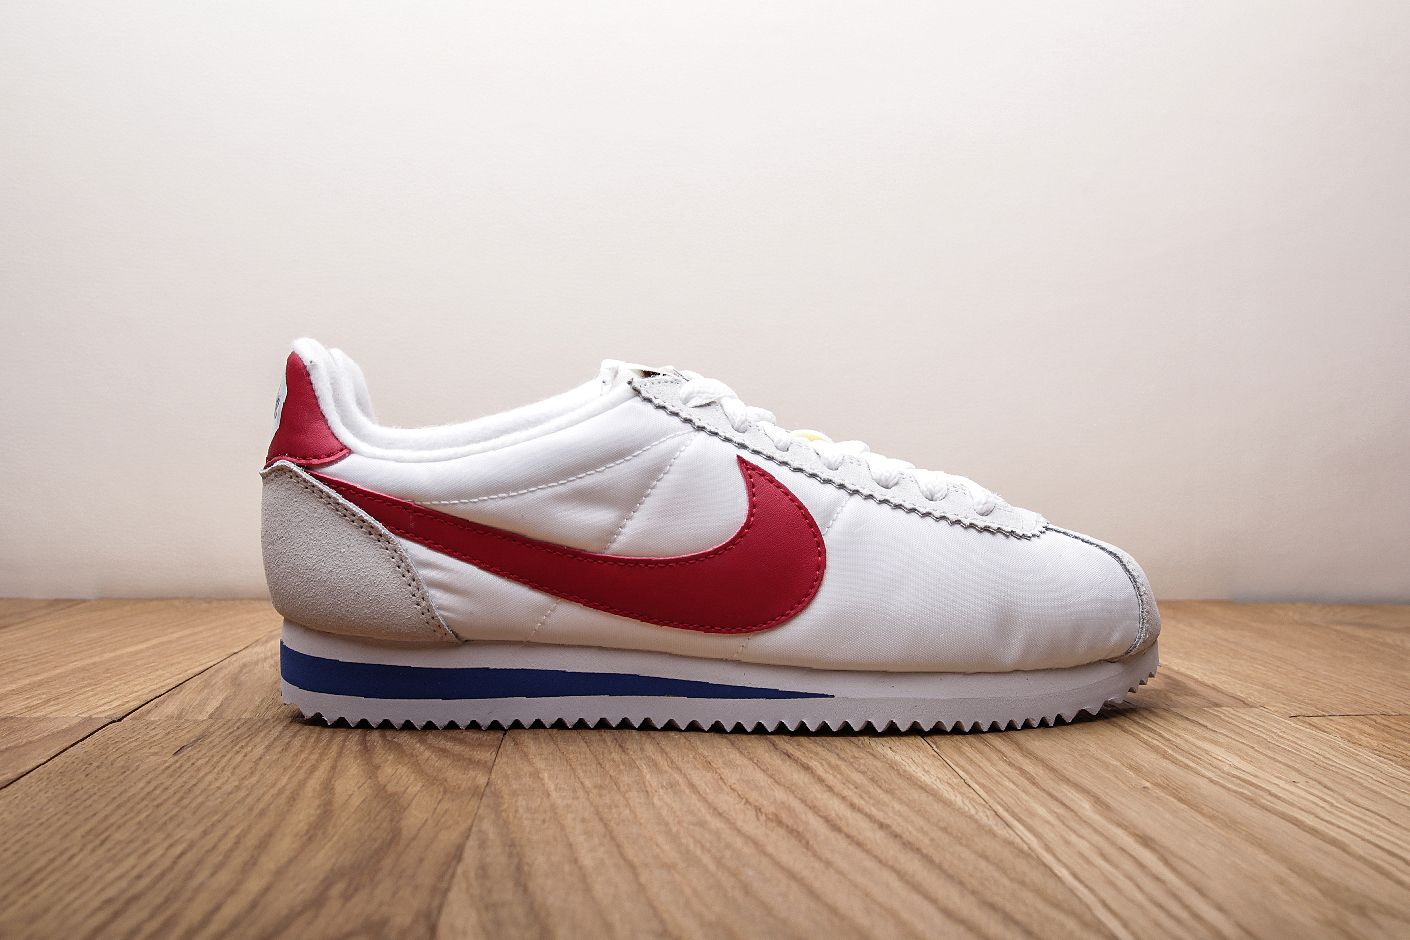 d6081858 Купить белые мужские кроссовки Classic Cortez Nylon Prem QS от Nike ...